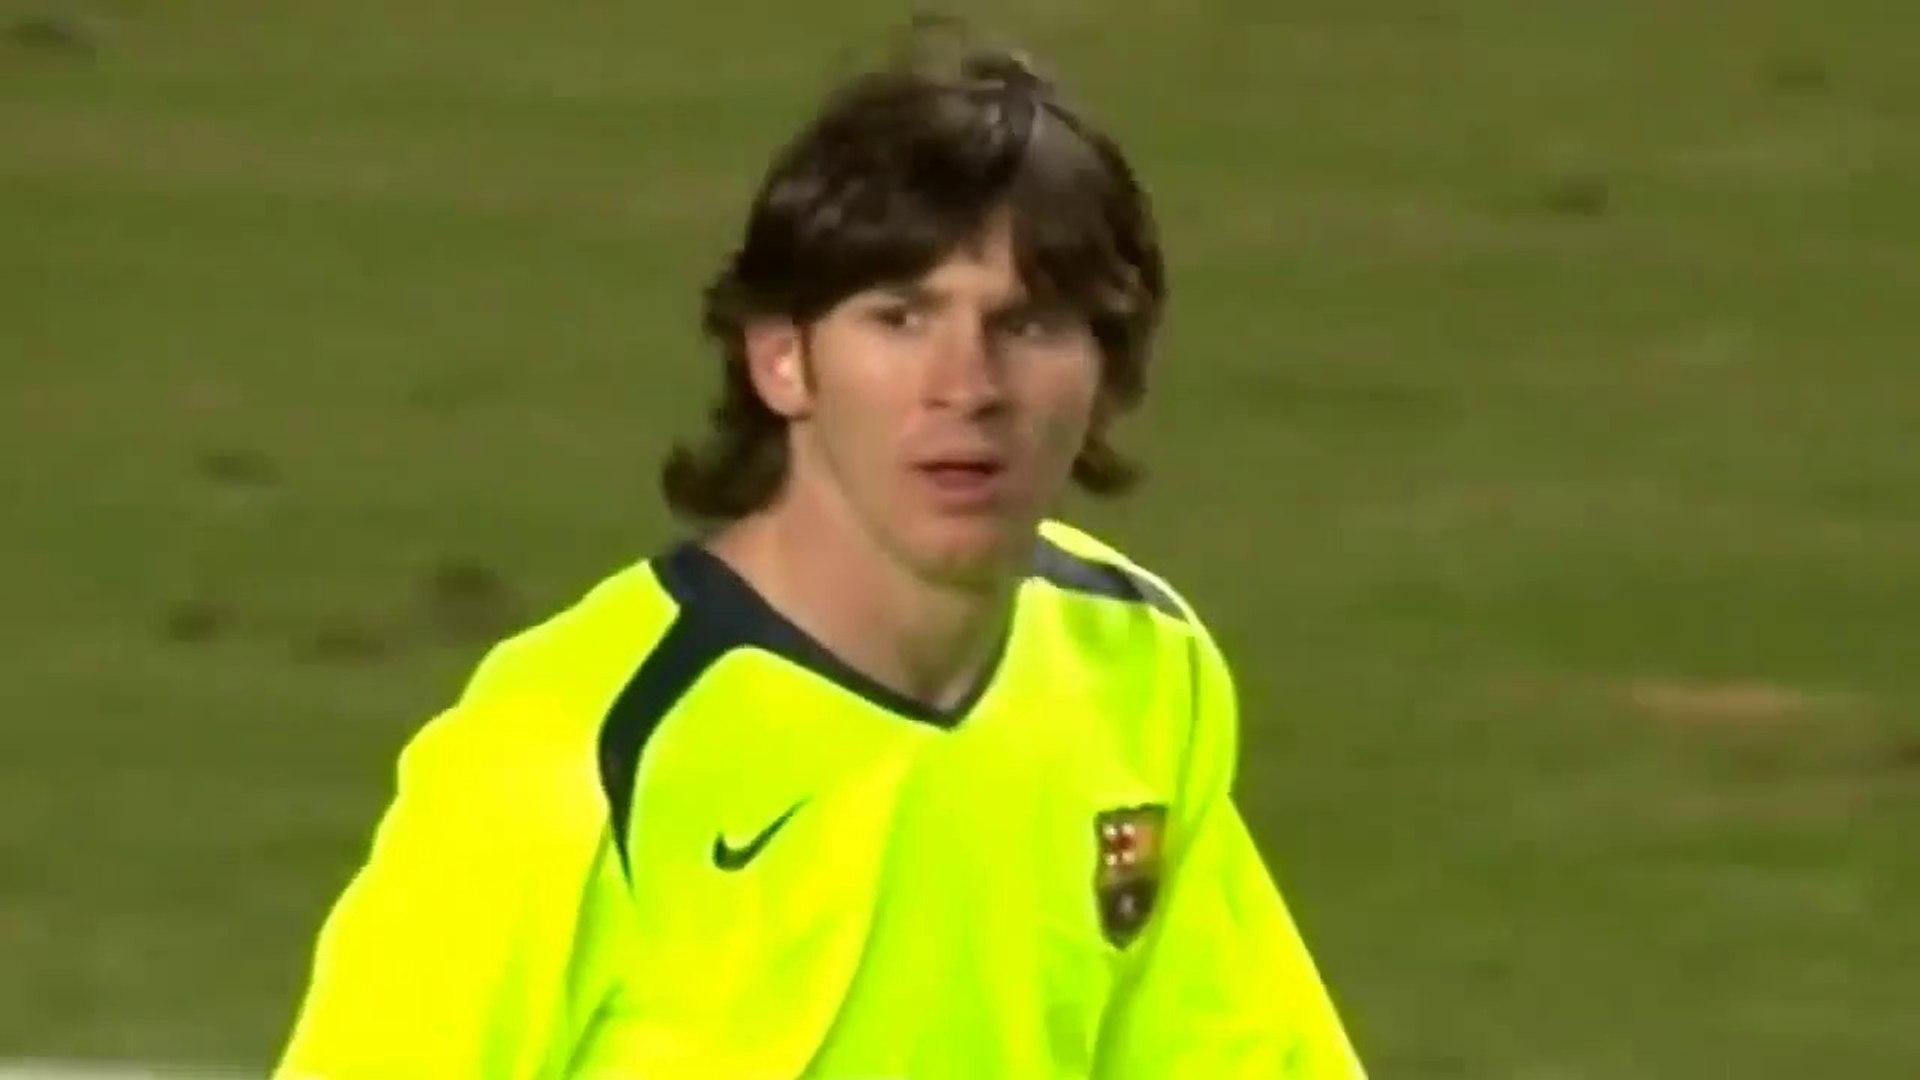 Lionel Messi ● Skills ● Chelsea 1:2 FC Barcelona ● Champions League  2005-06